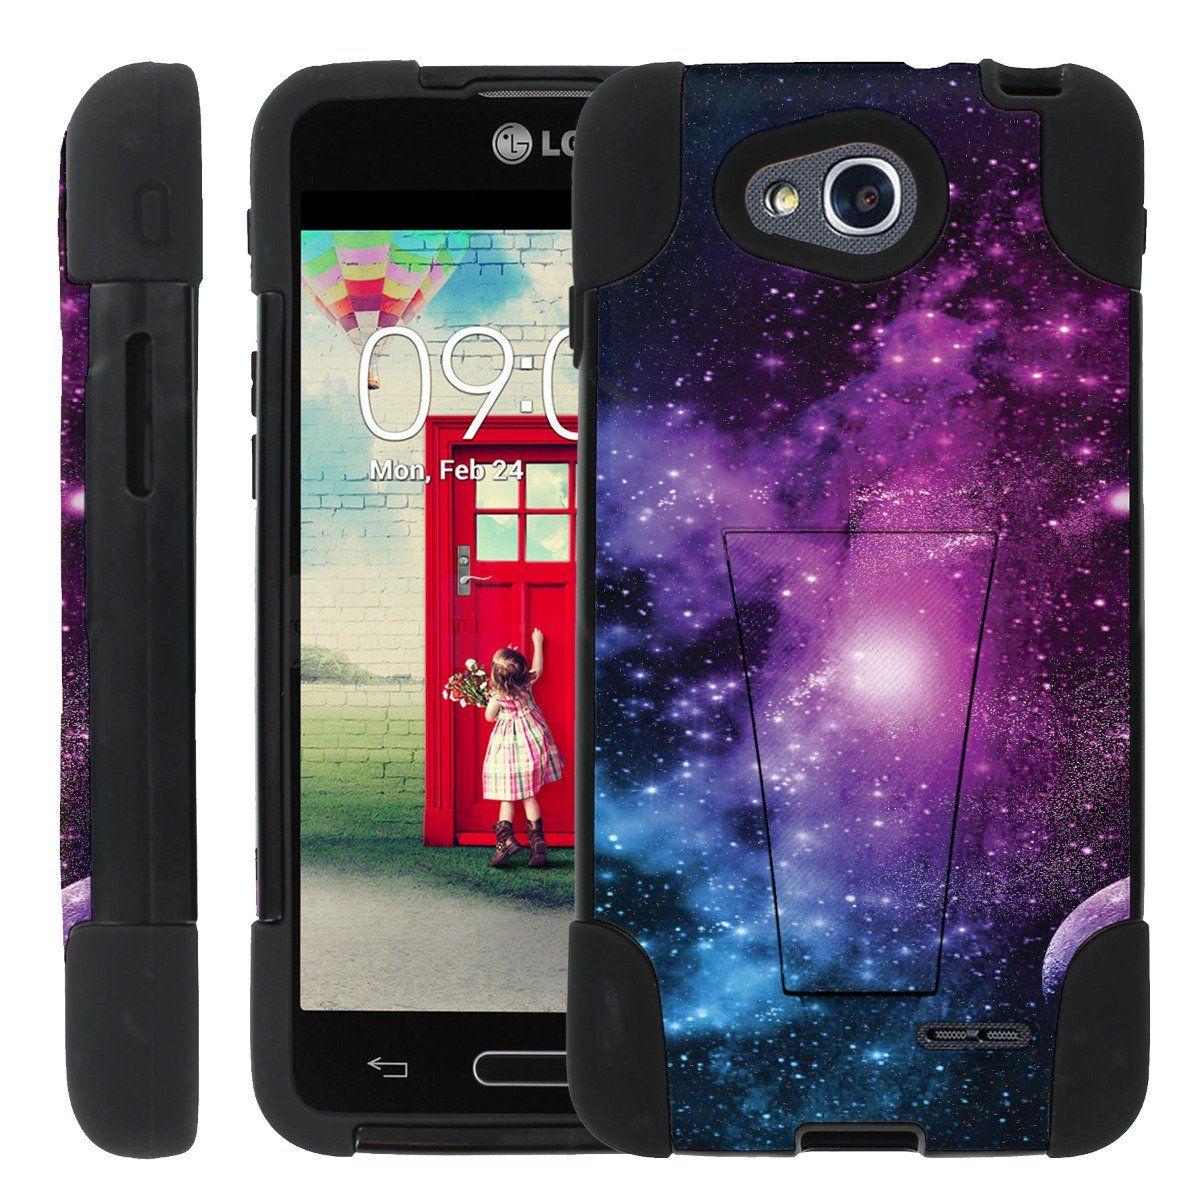 timeless design fcfdd 470e3 LG Optimus L90 Case, Cute Cartoon Baby Face Pattern Hard Patterned ...